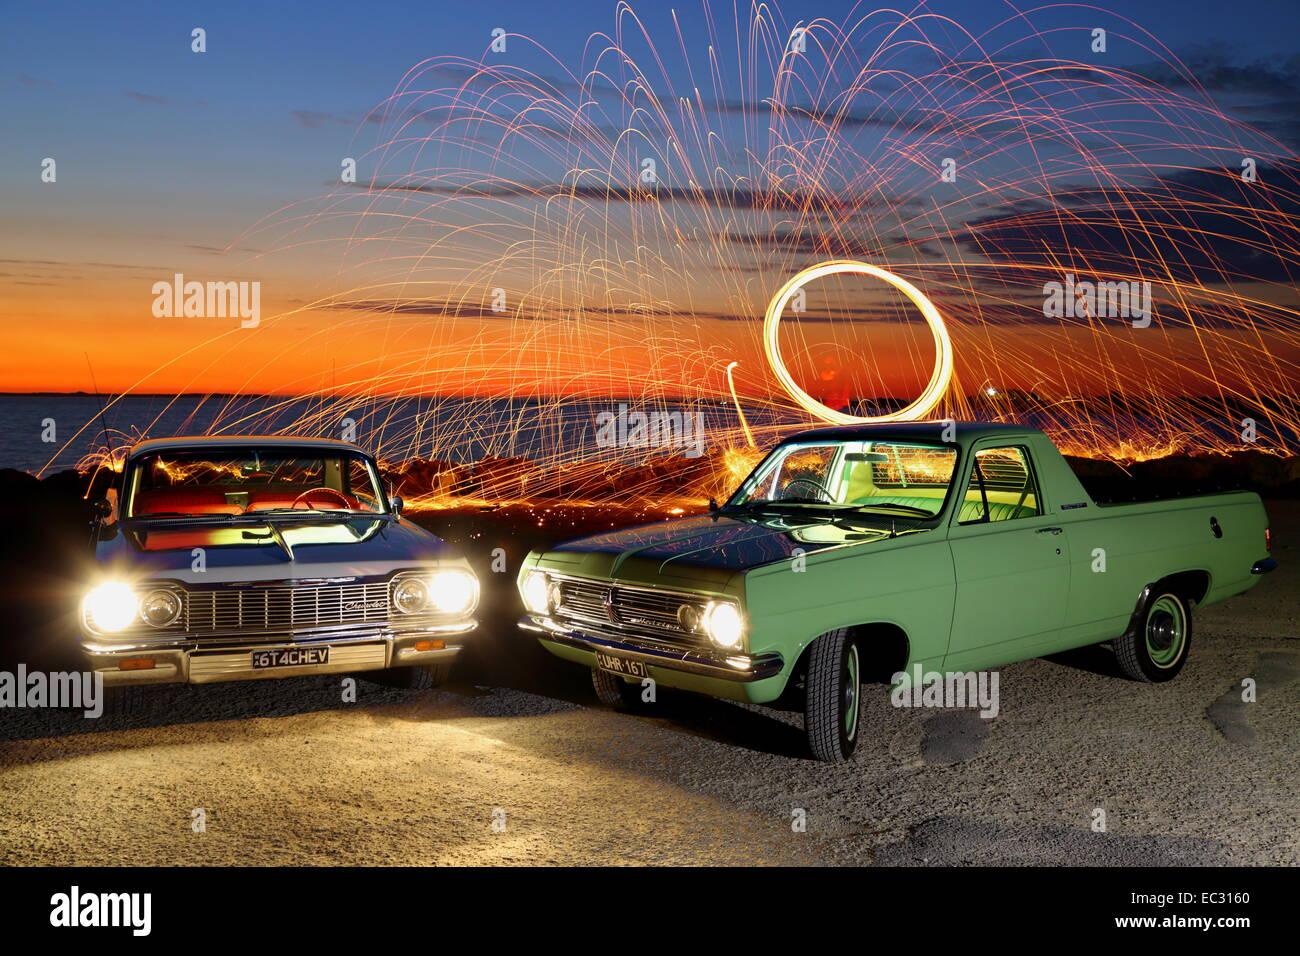 2017 impala owners manual pdf